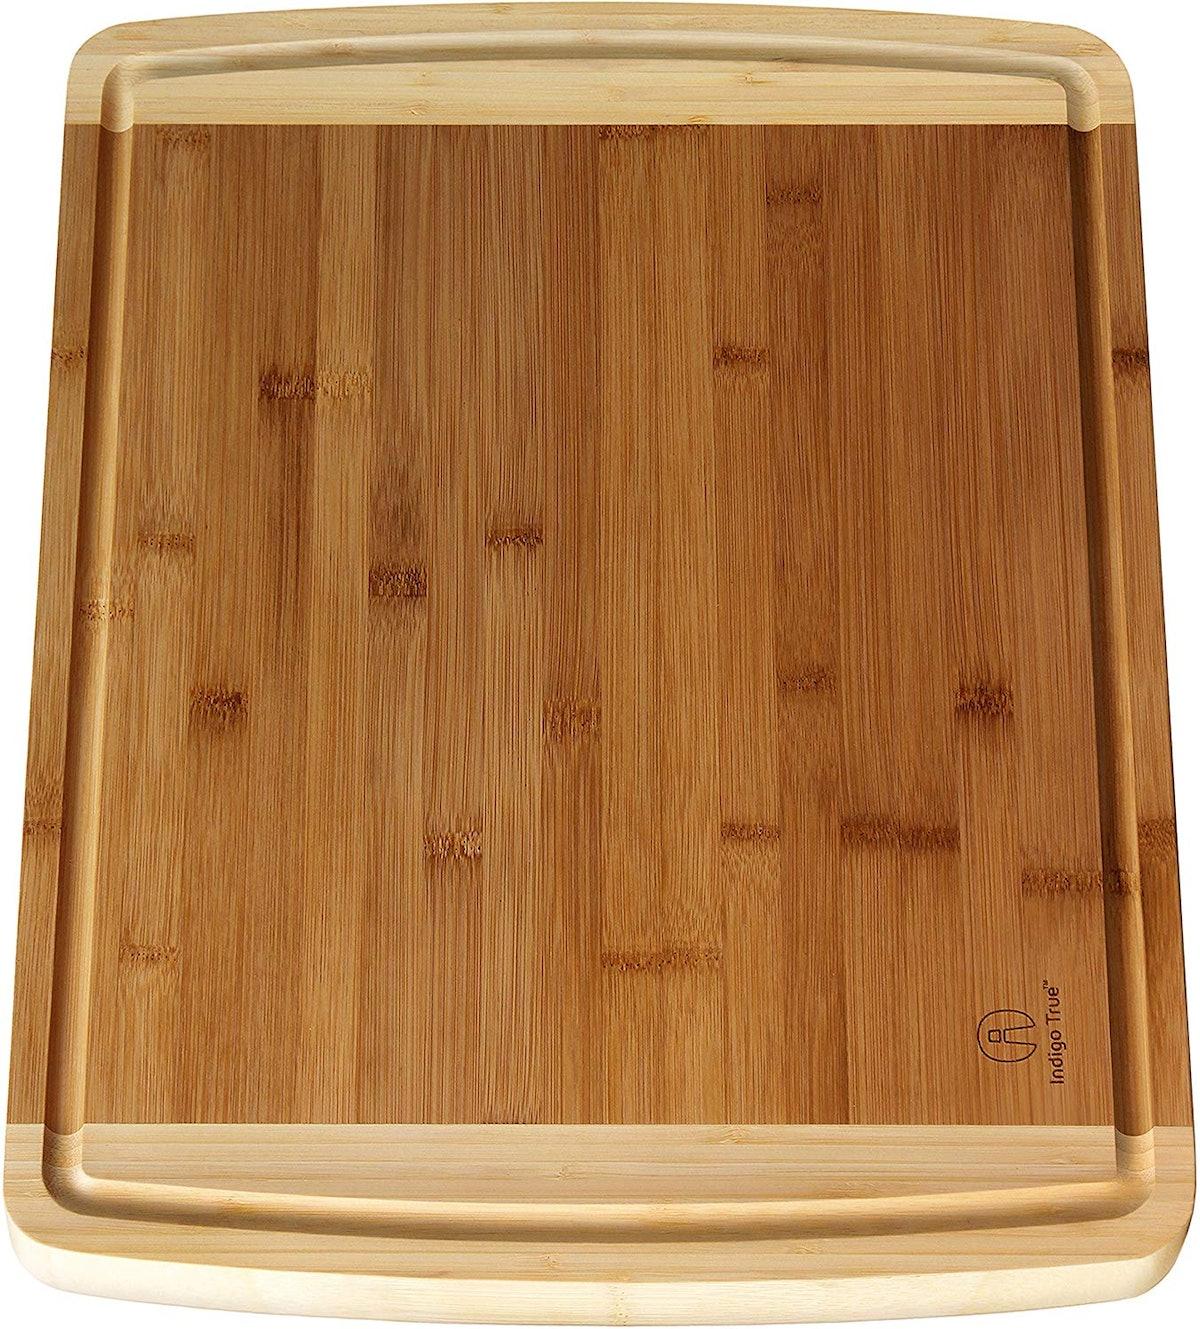 Indigo True Bamboo Cutting Board